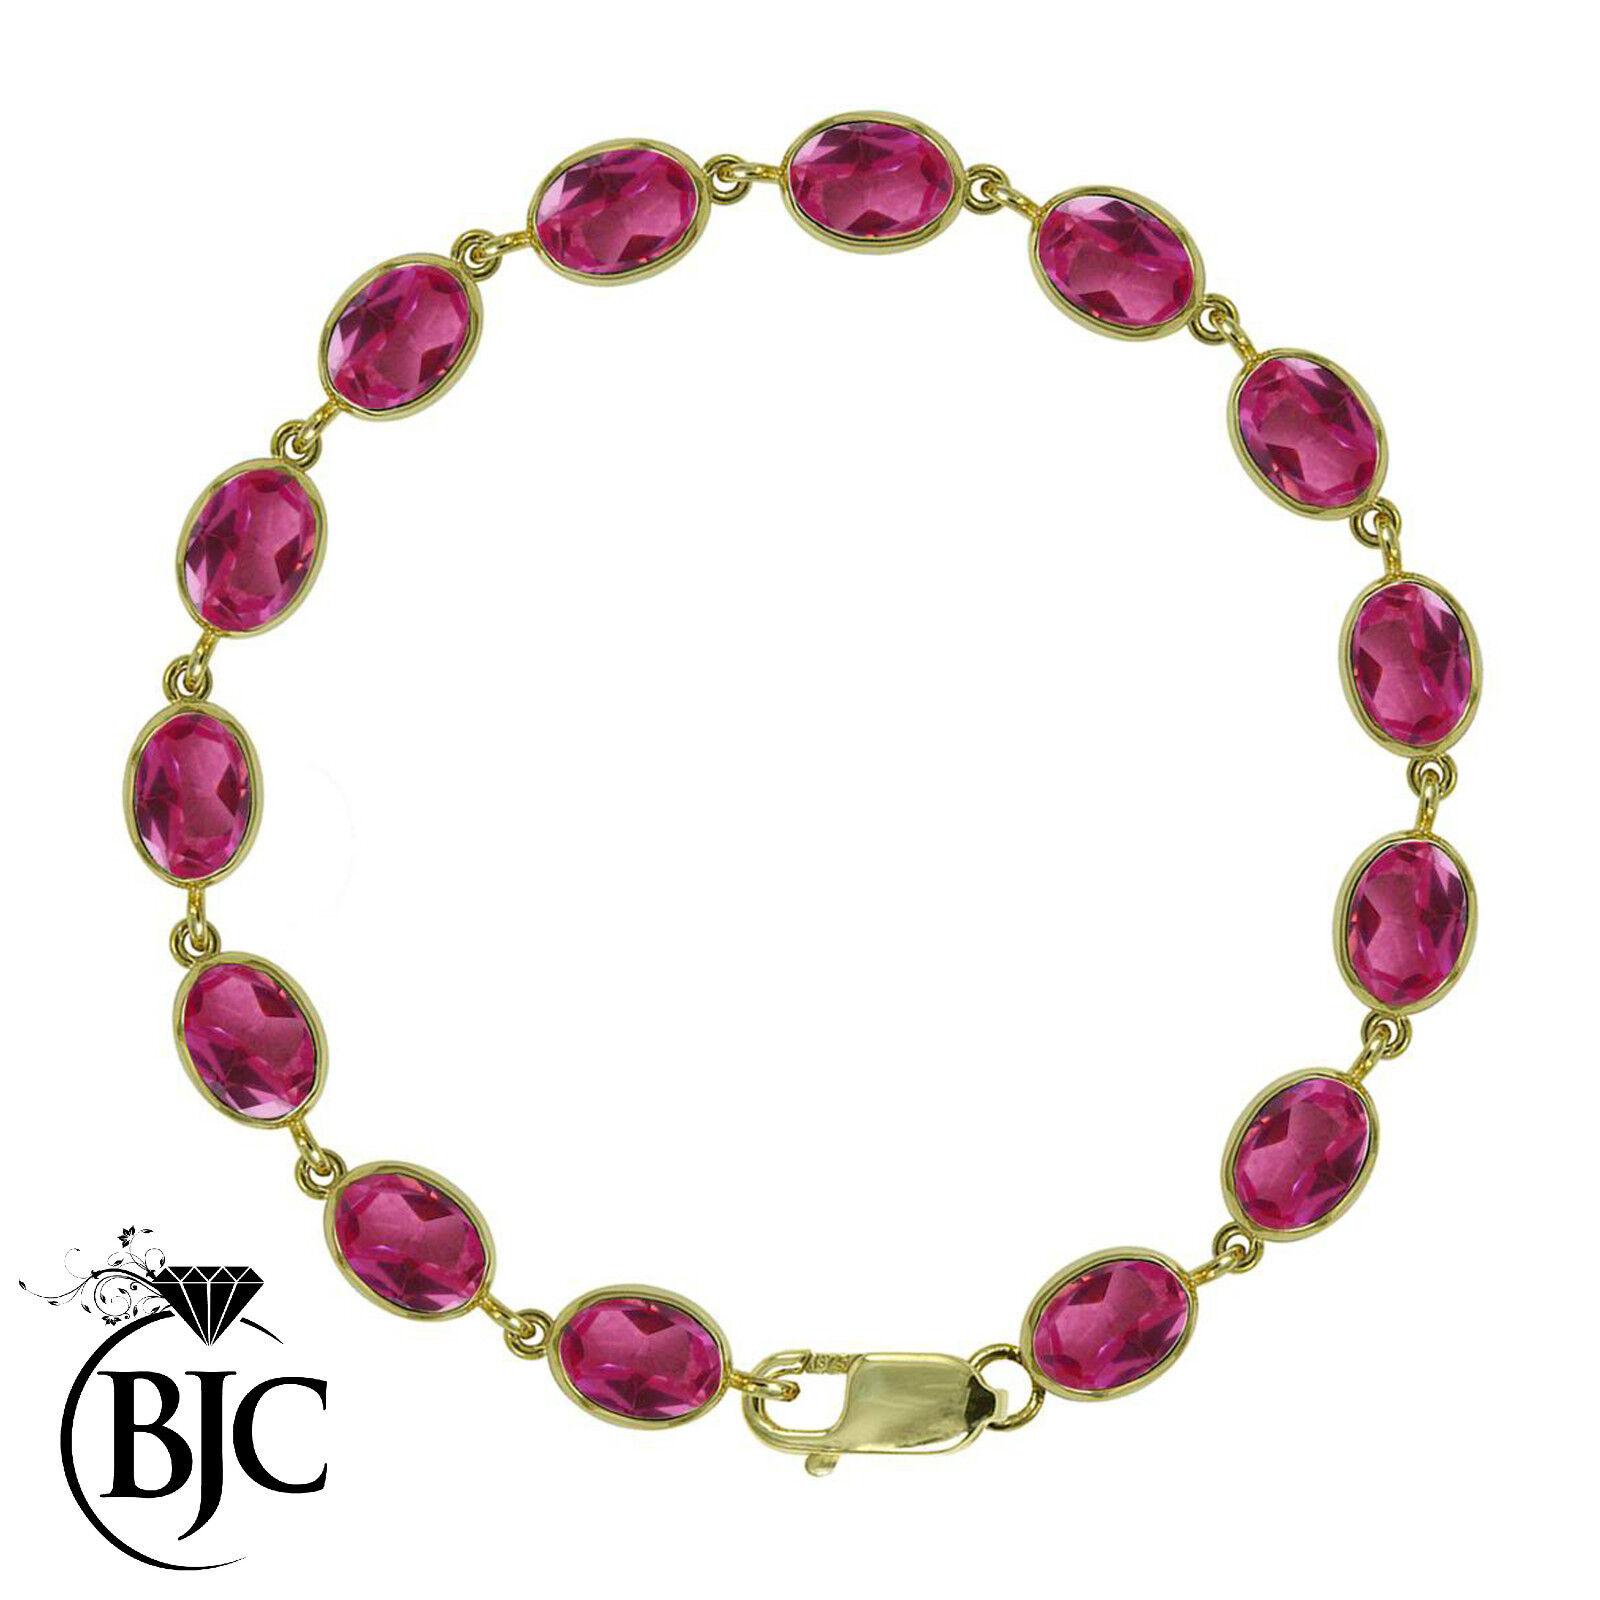 BJC® 9ct Yellow gold Natural Pink Topaz 21.00ct Oval Gemstone Tennis Bracelet